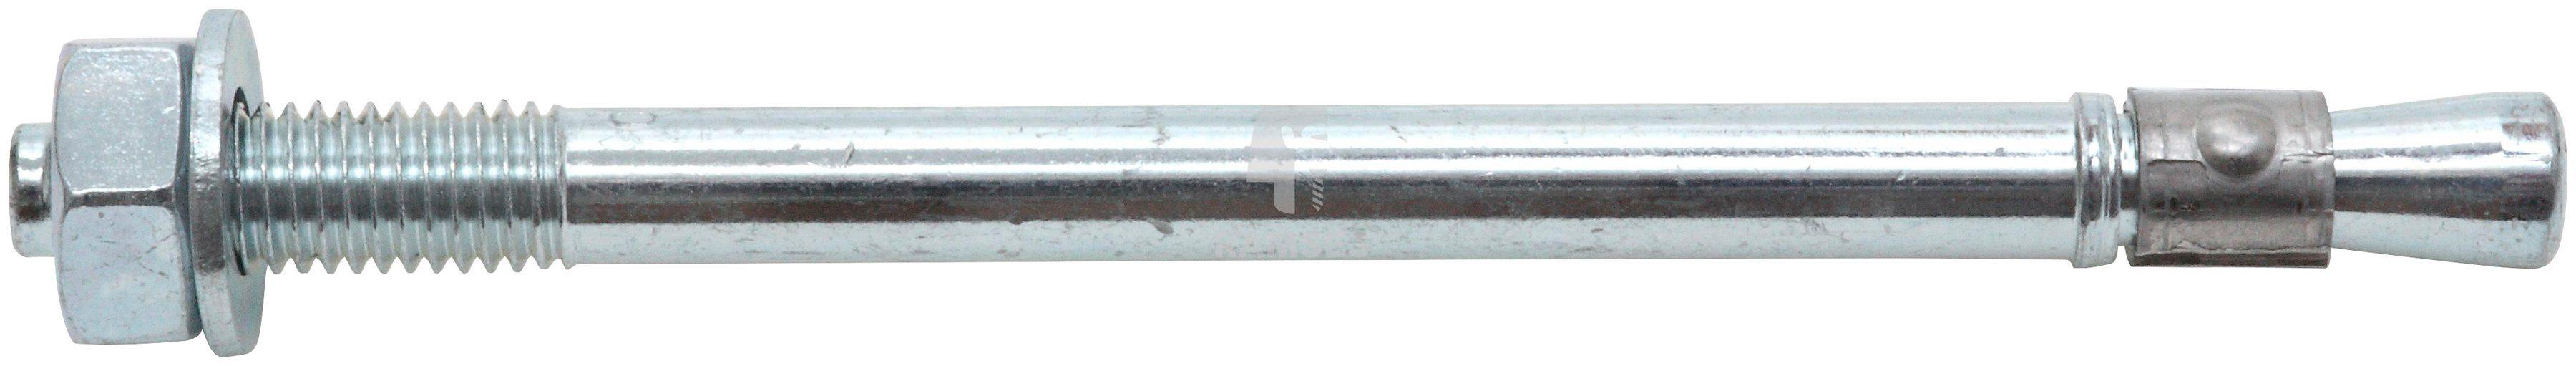 RAMSES Dübel , Bolzenanker B M12 x 255 mm, 10 Stück